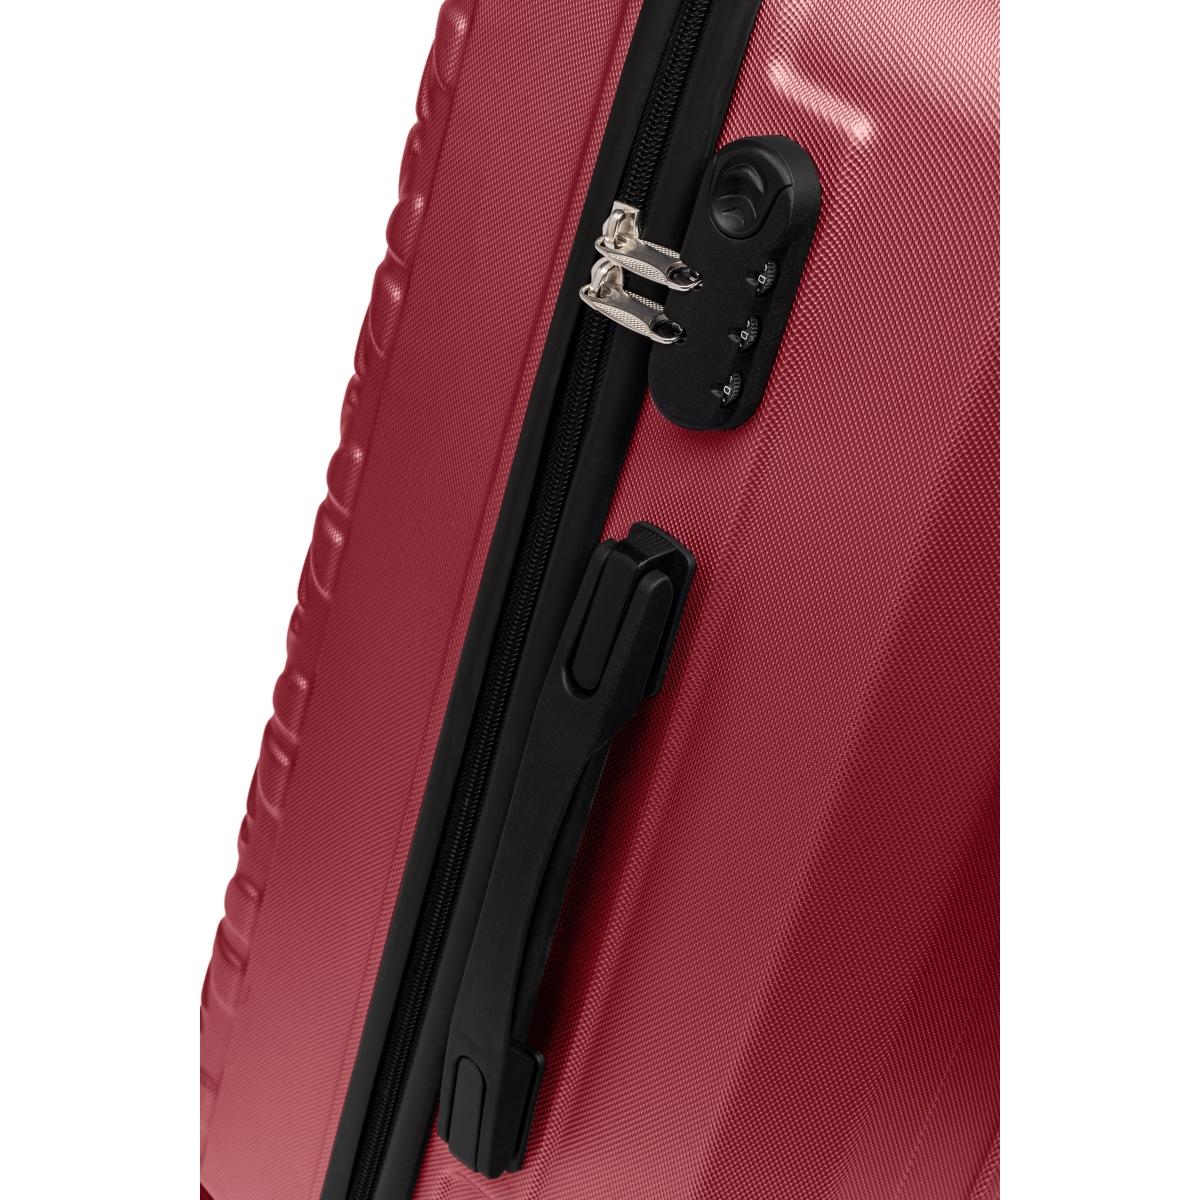 Gedox Abs 3'lü Valiz Seyahat Seti - Model:800.13 Bordo